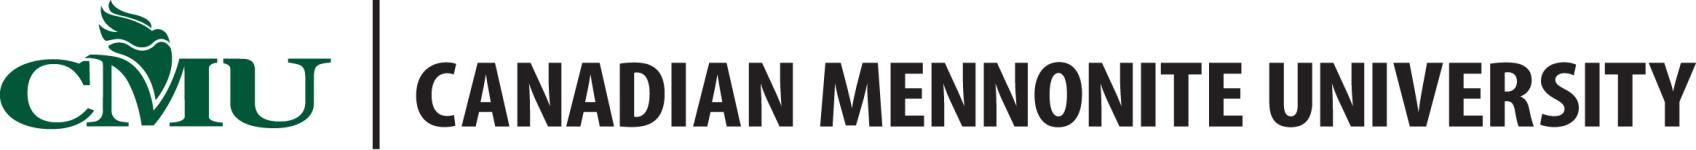 Logo of Canadian Mennonite University